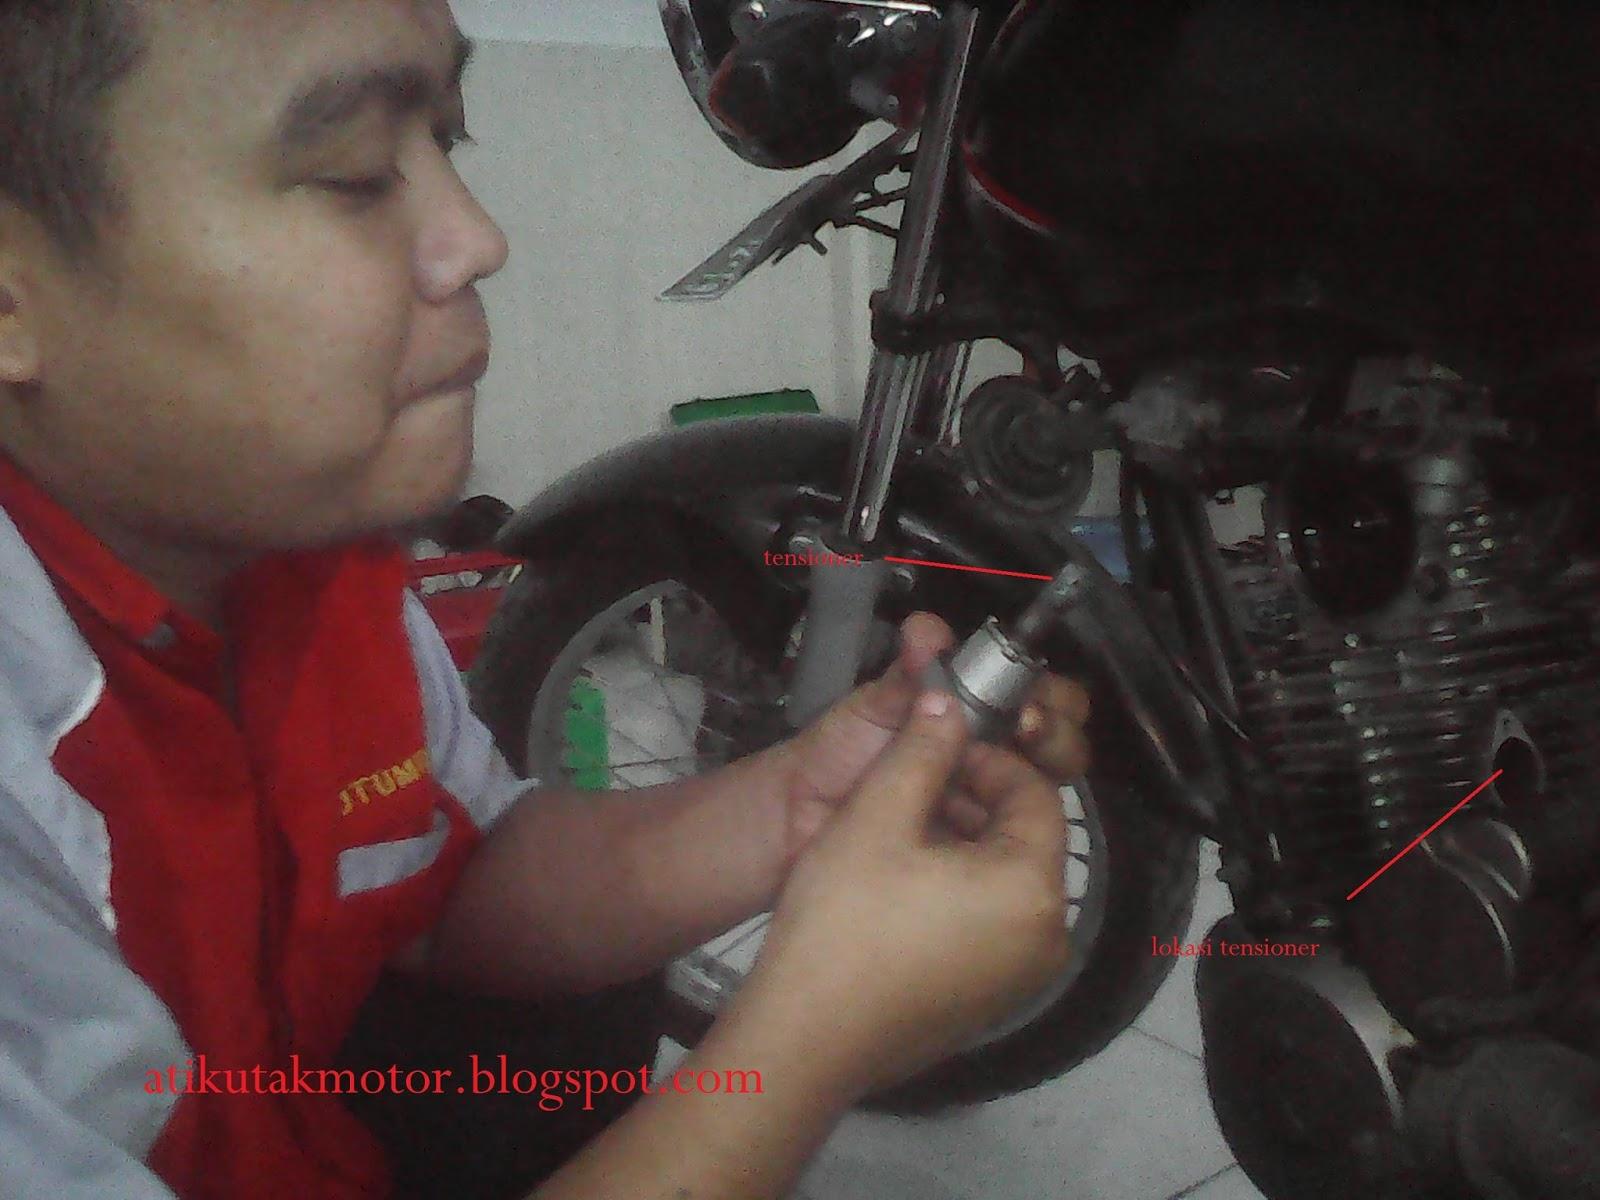 Mengatasi Rantai Timing Rantai Keteng Mega Pro Kendor Utak Atik Sepeda Motor